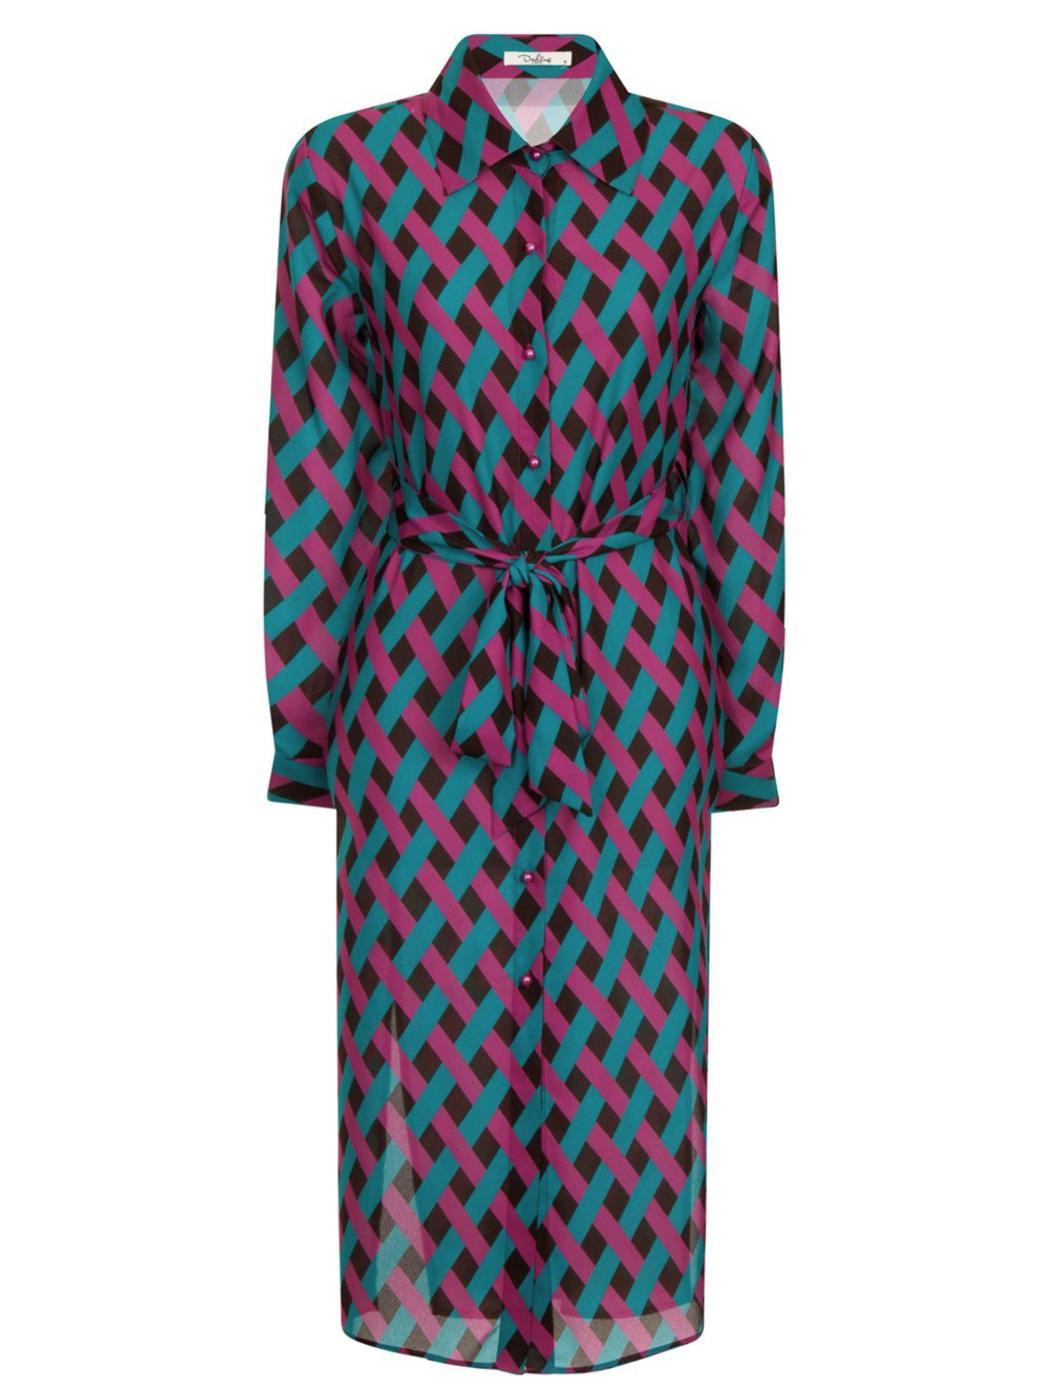 Erika DARLING Retro 70s Op Art Weave Shirt Dress